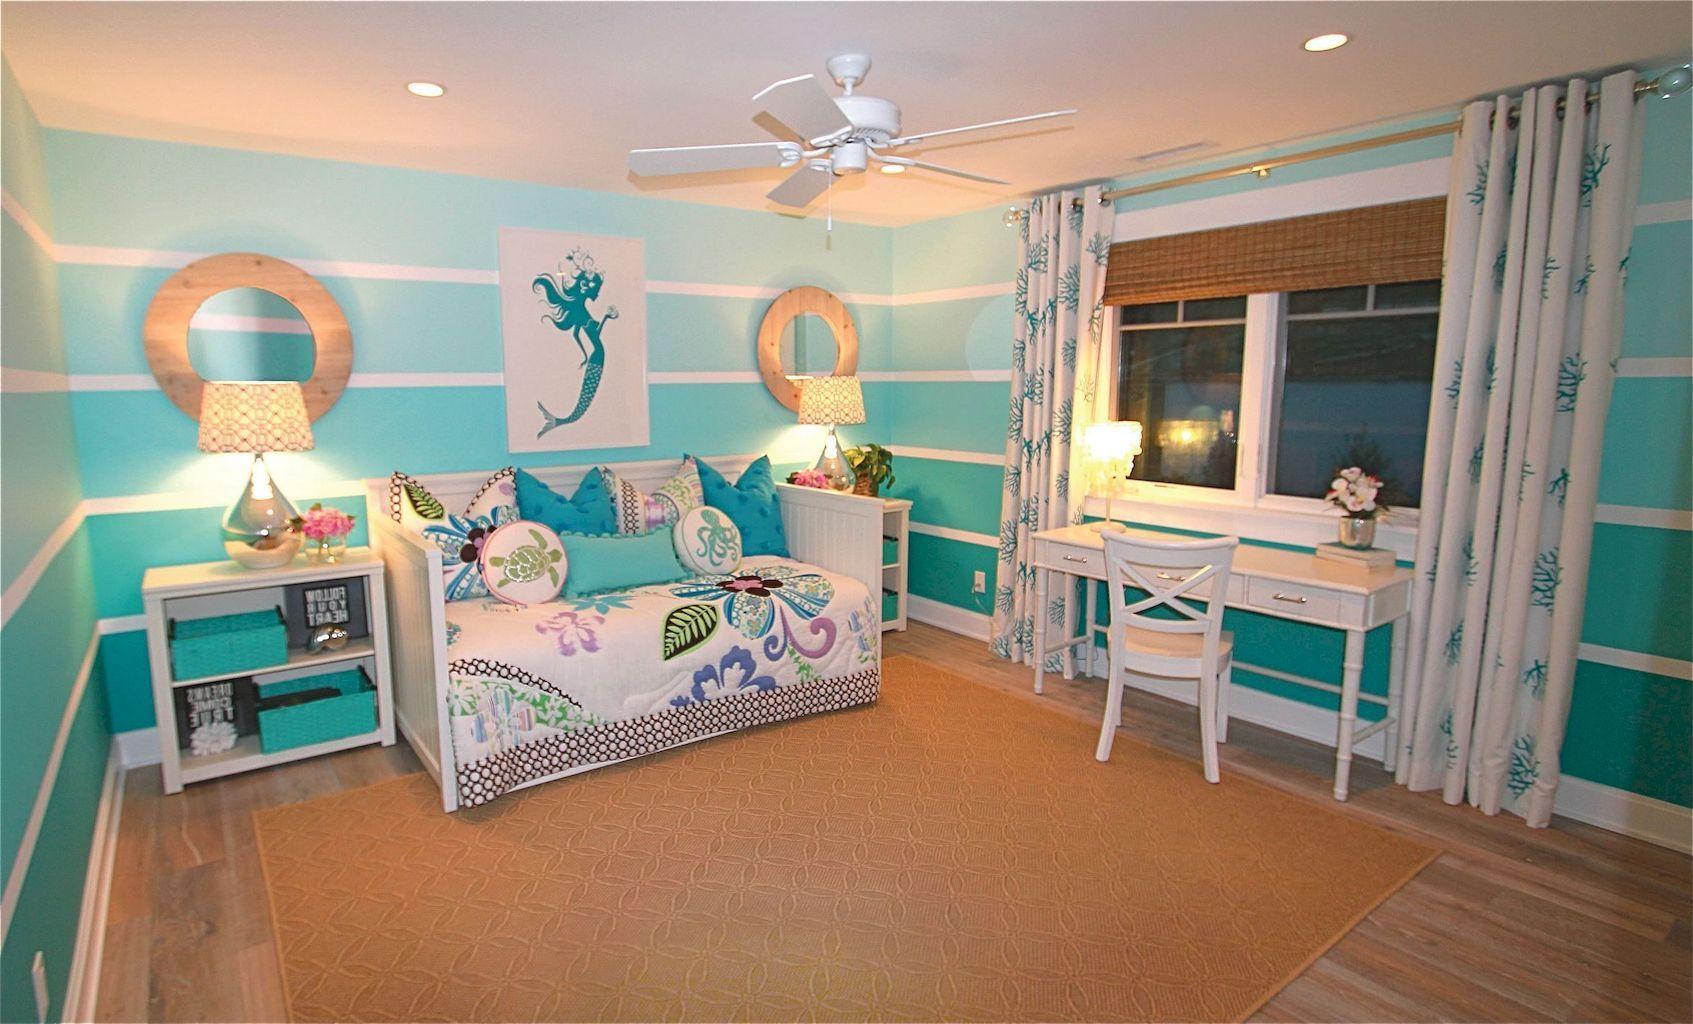 80 Cool Beach Bedroom Design Ideas images